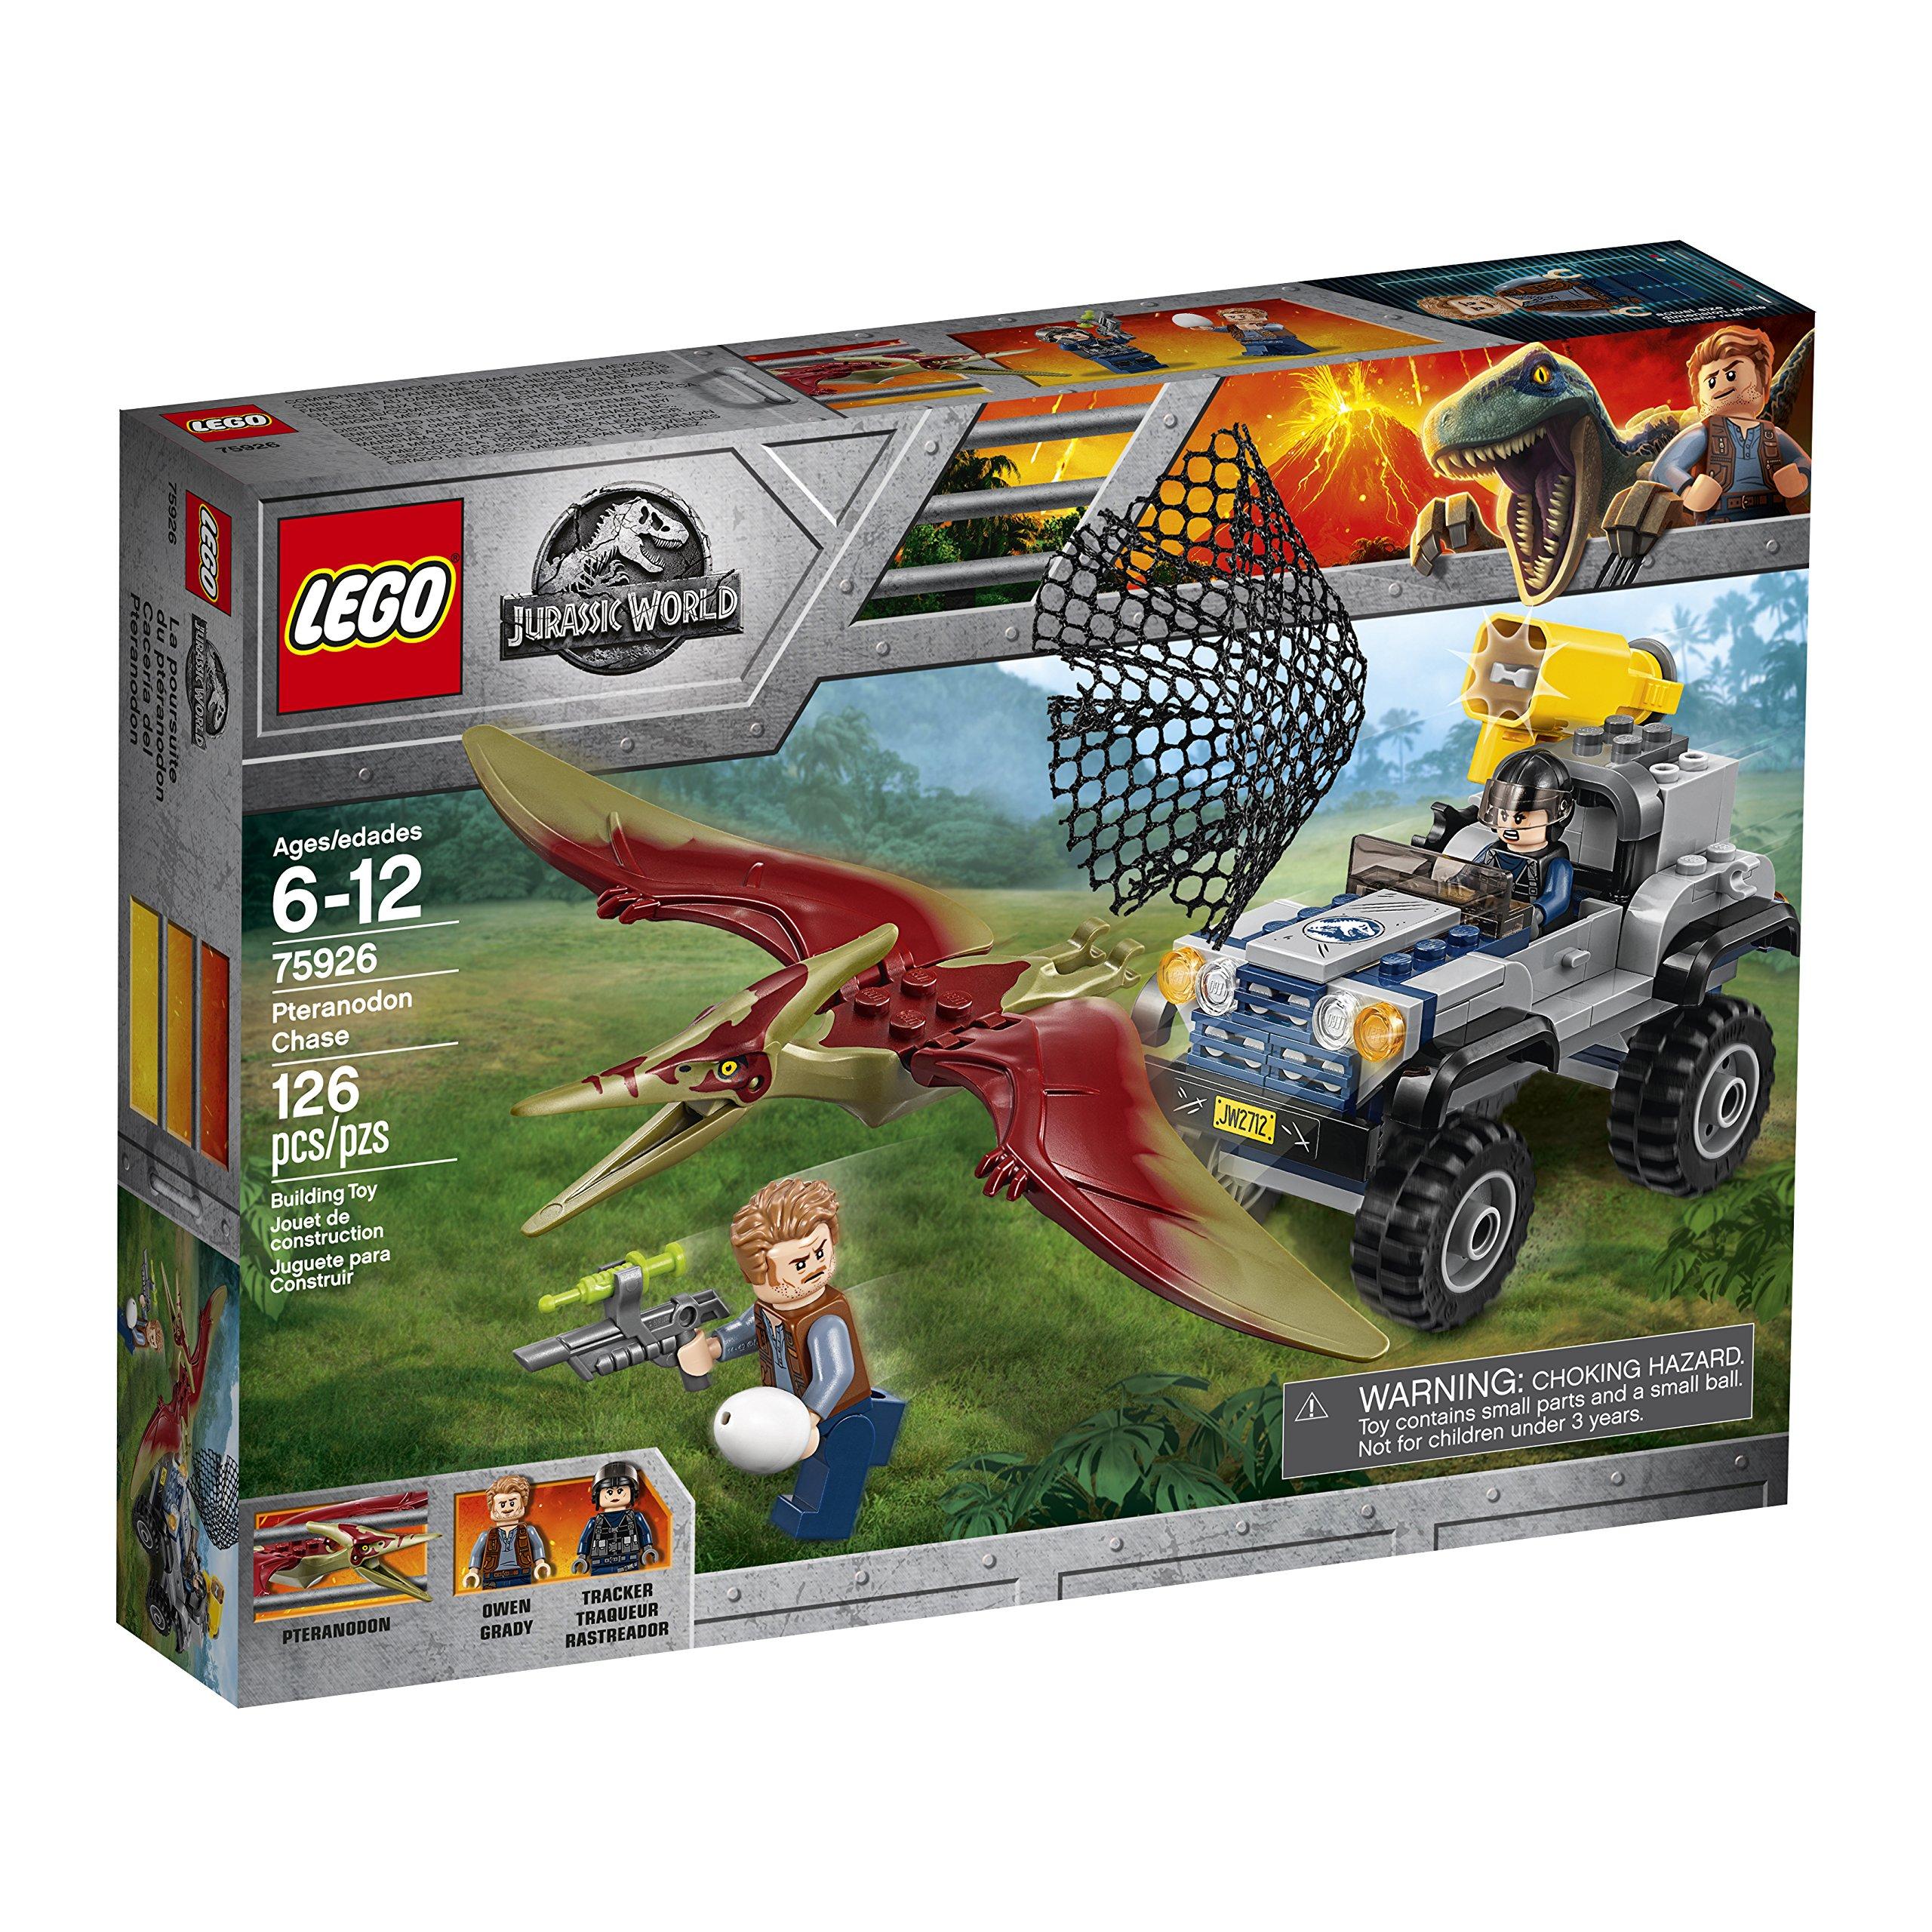 LEGO Jurassic World Pteranodon Chase 75926 Building Kit (126 Piece) by LEGO (Image #4)